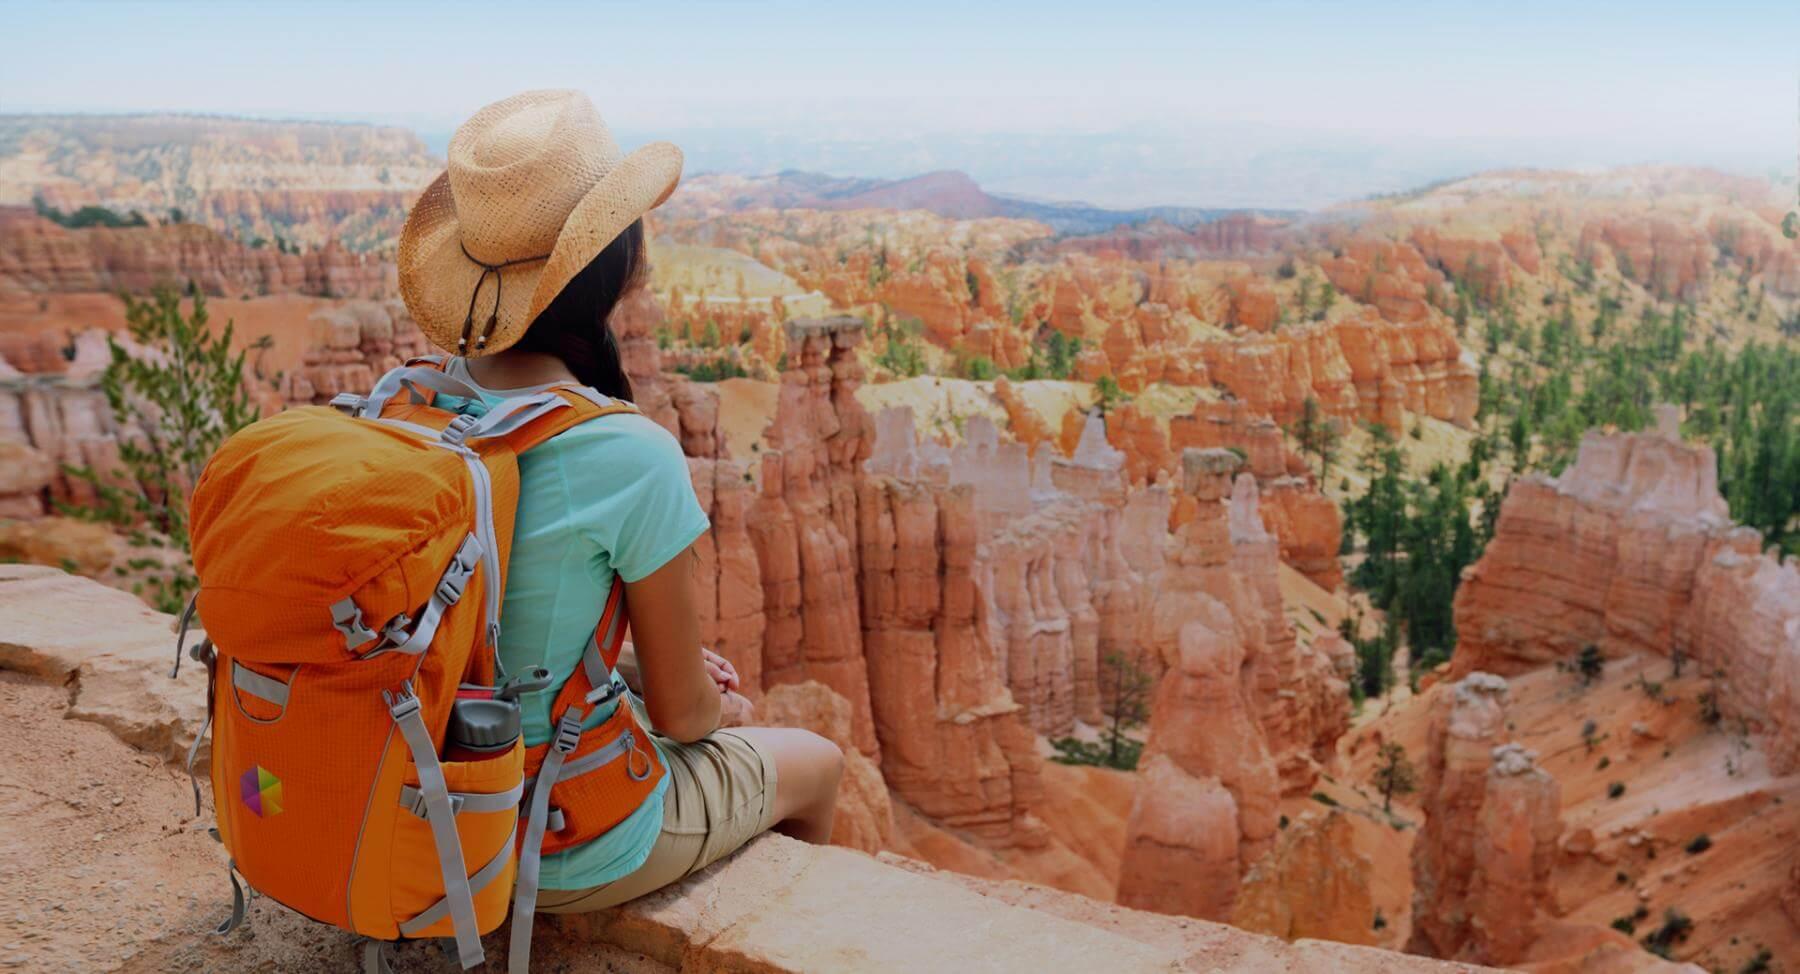 Путешествия: умные фразы, высказывания, цитаты, афоризмы, статусы